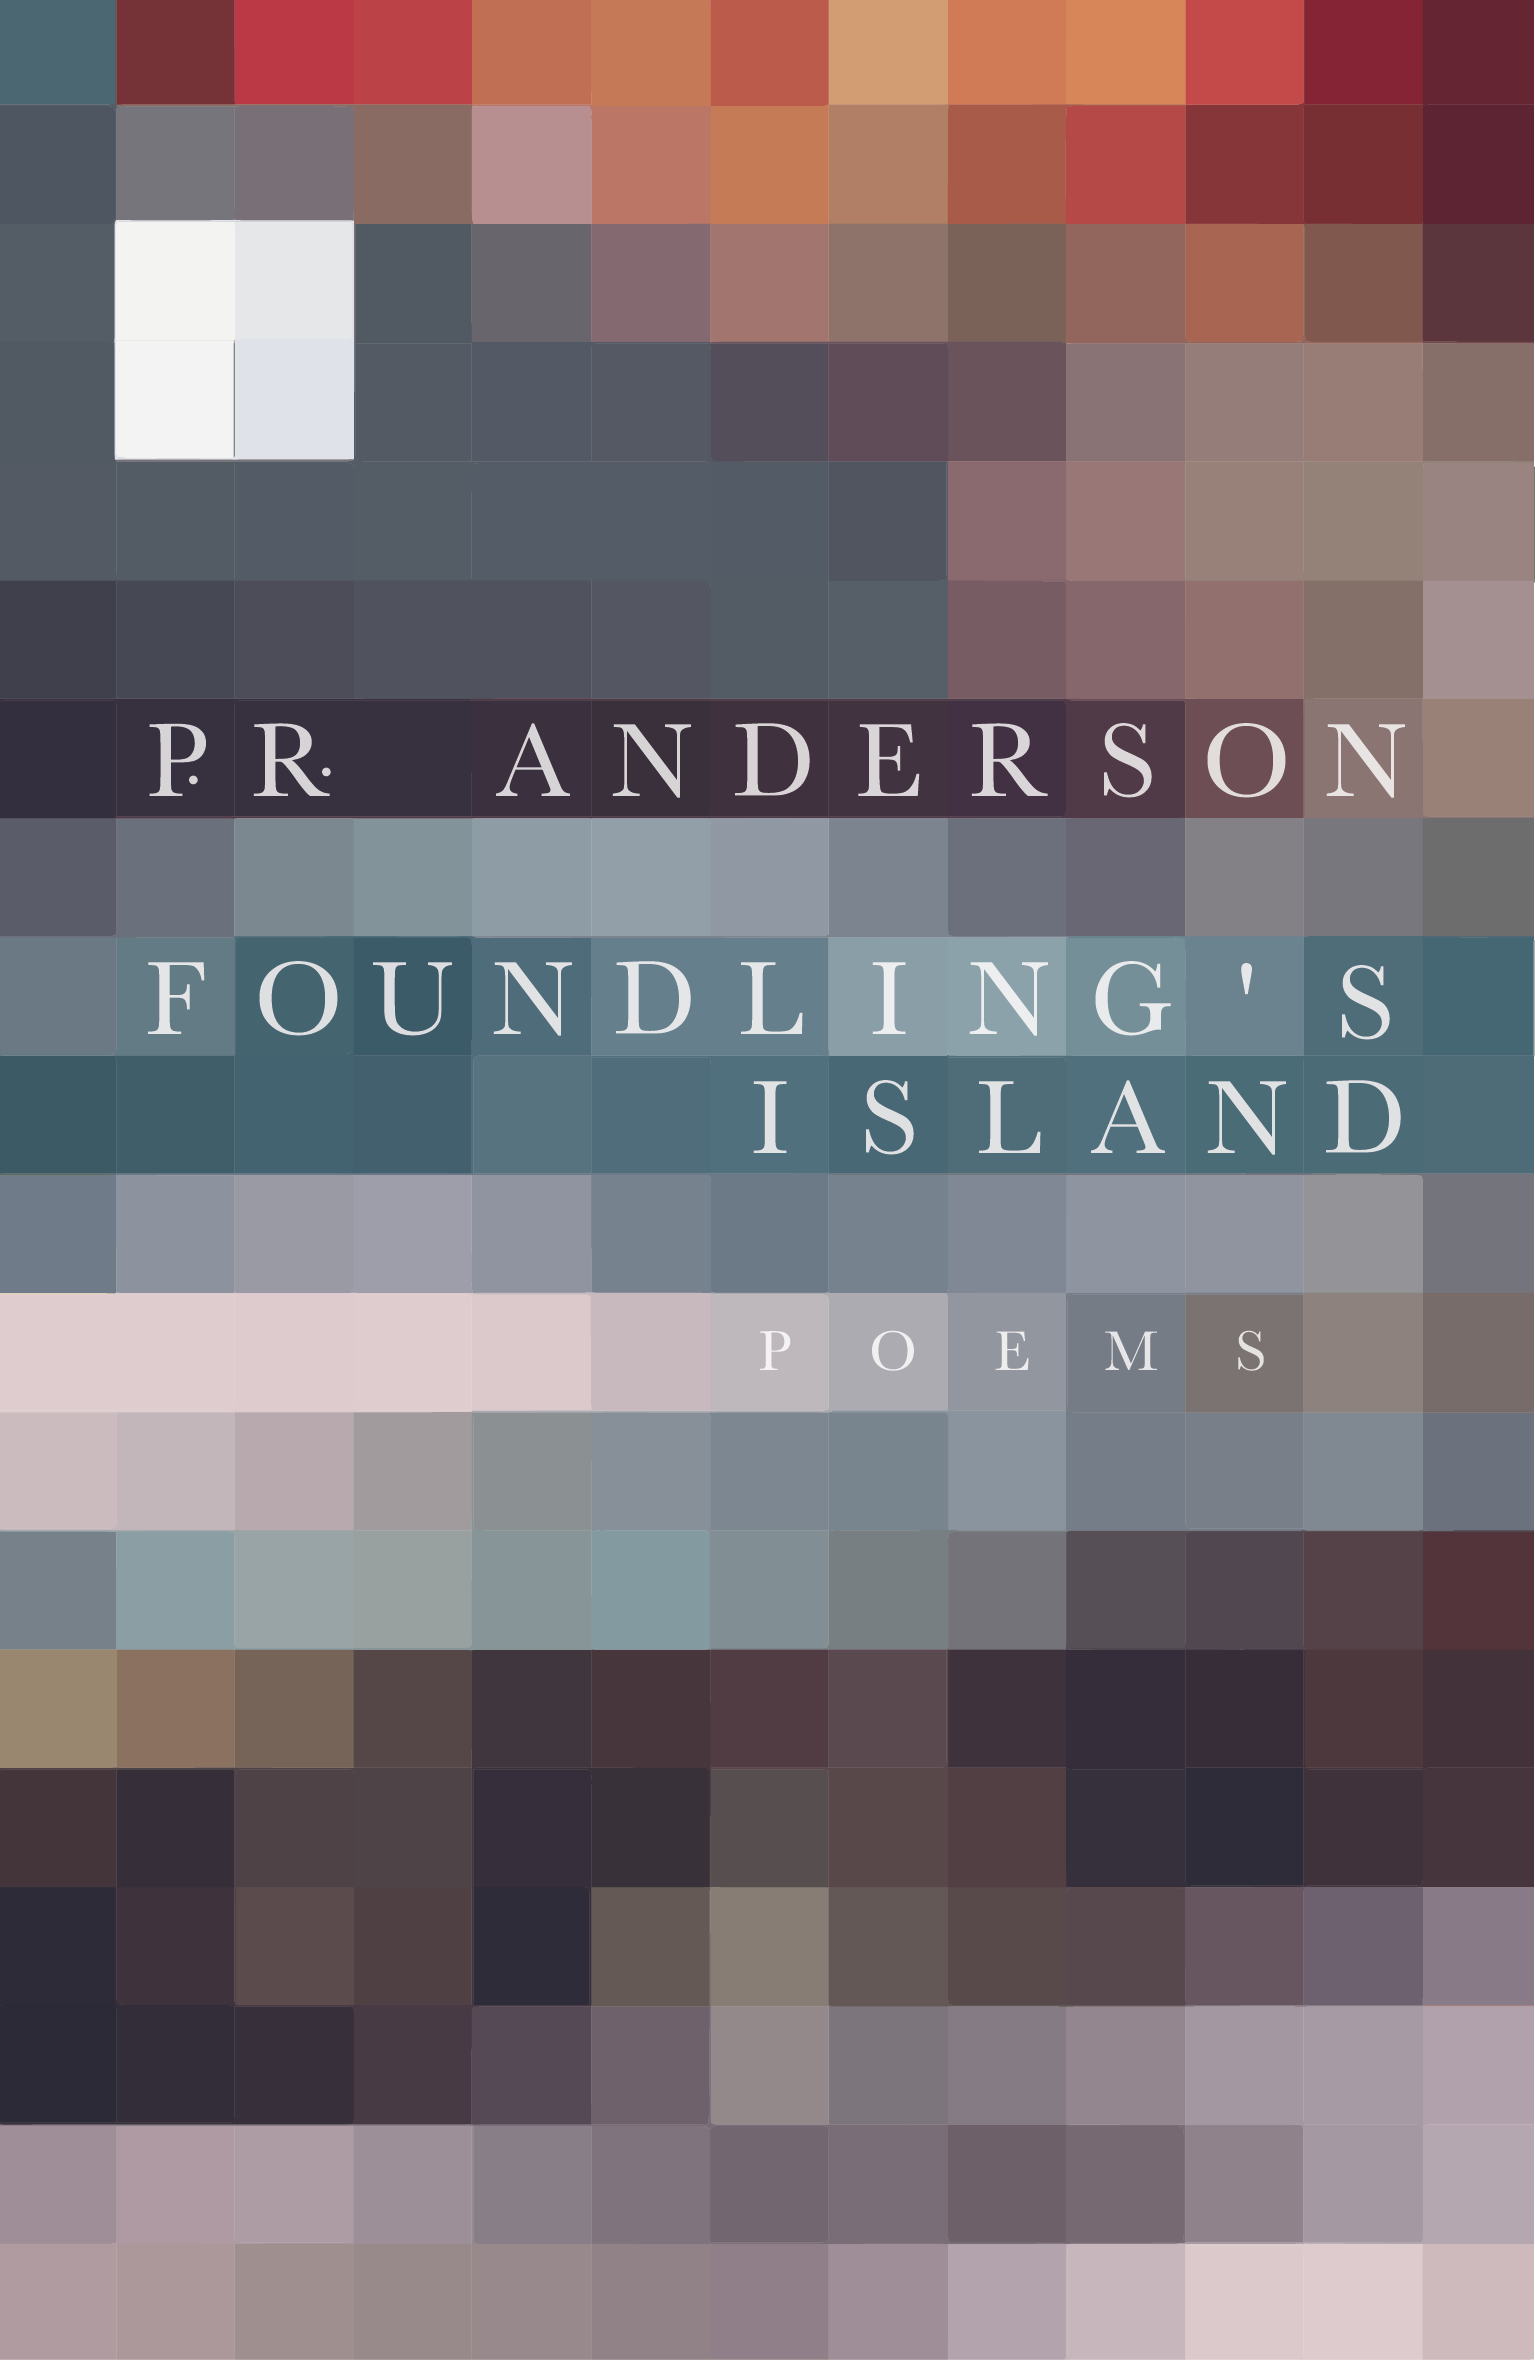 pr-anderson_foundlings-island